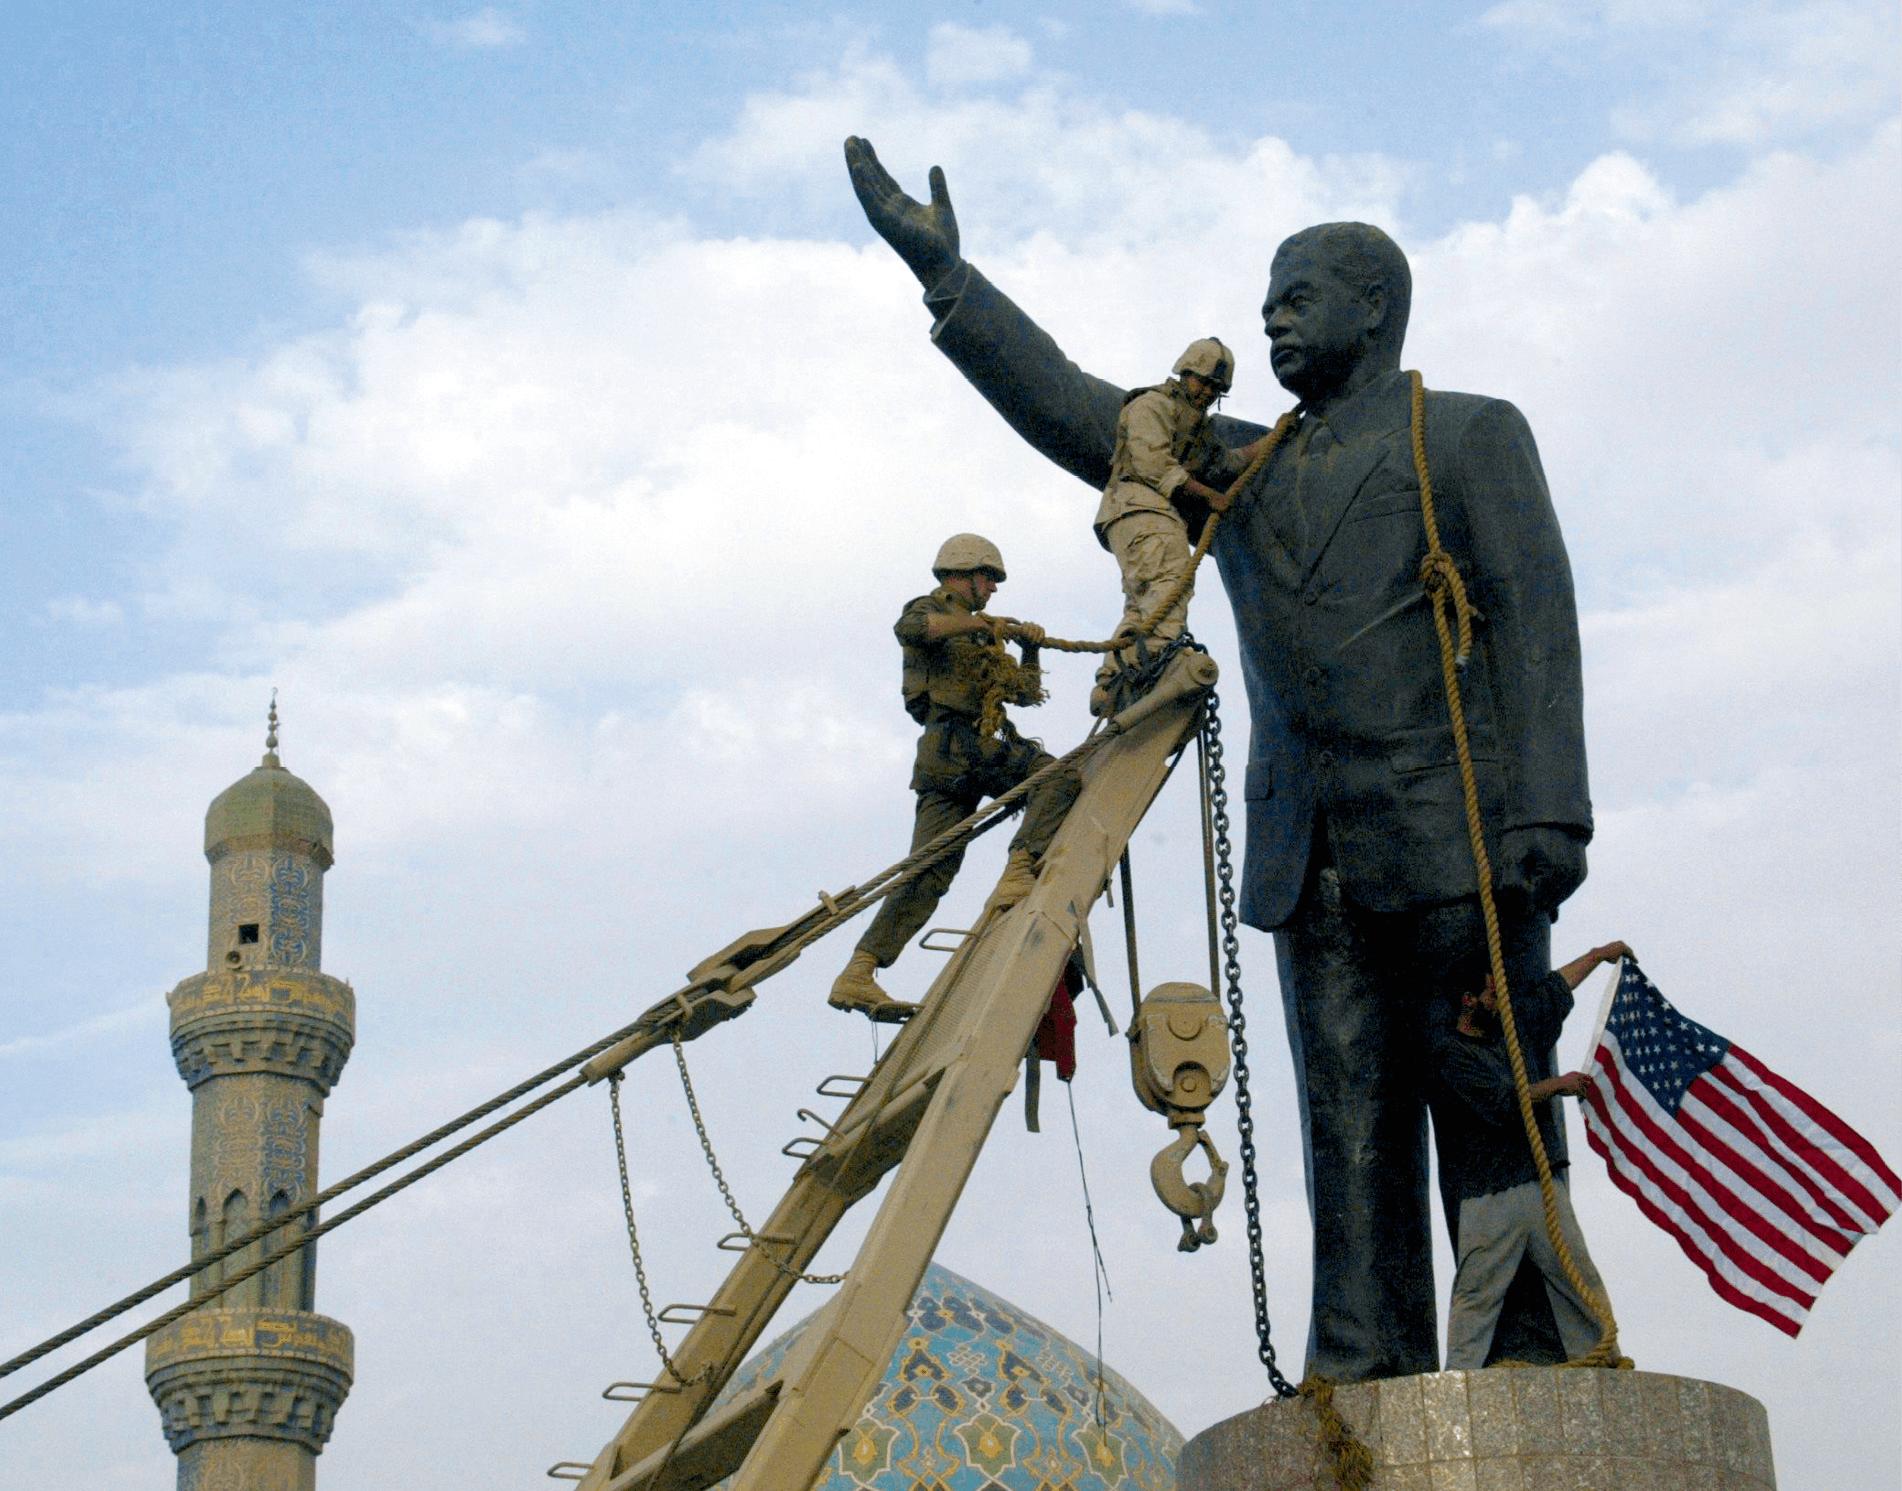 Ramzi Haidar, chute de la statue de Saddam Hussein, Bagdad (Irak), 9 avril 2003, photographie.